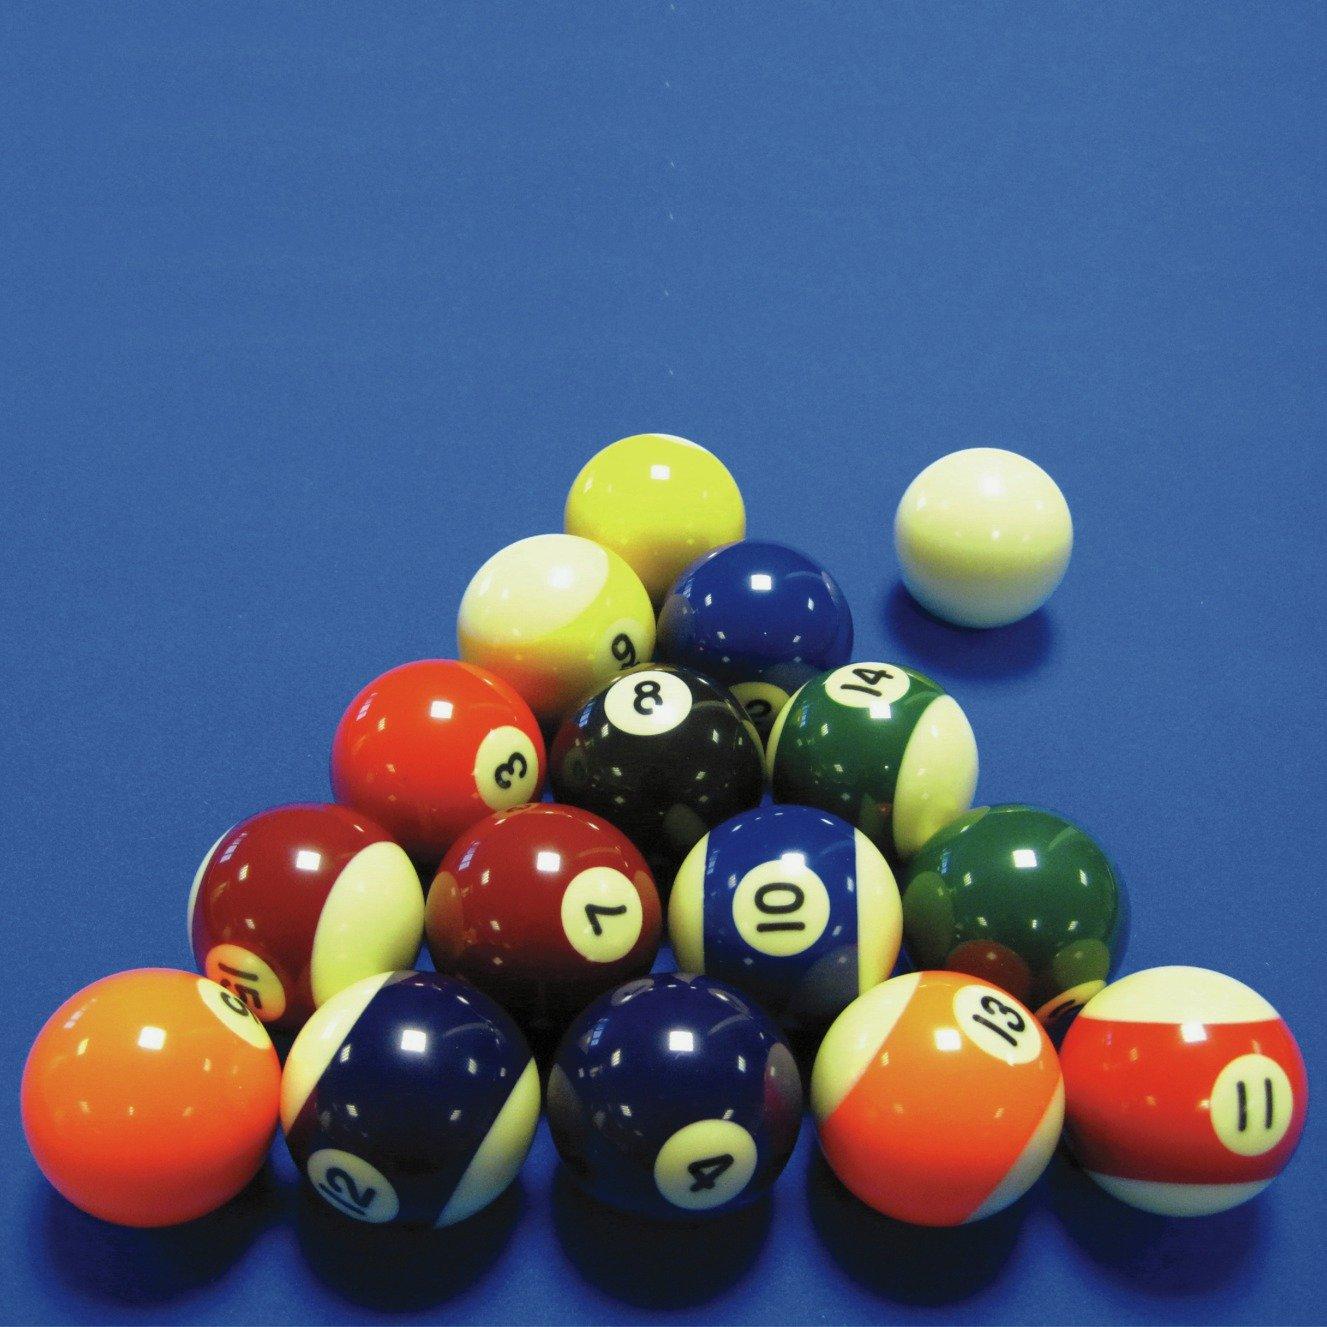 48mm Pool Balls Set.